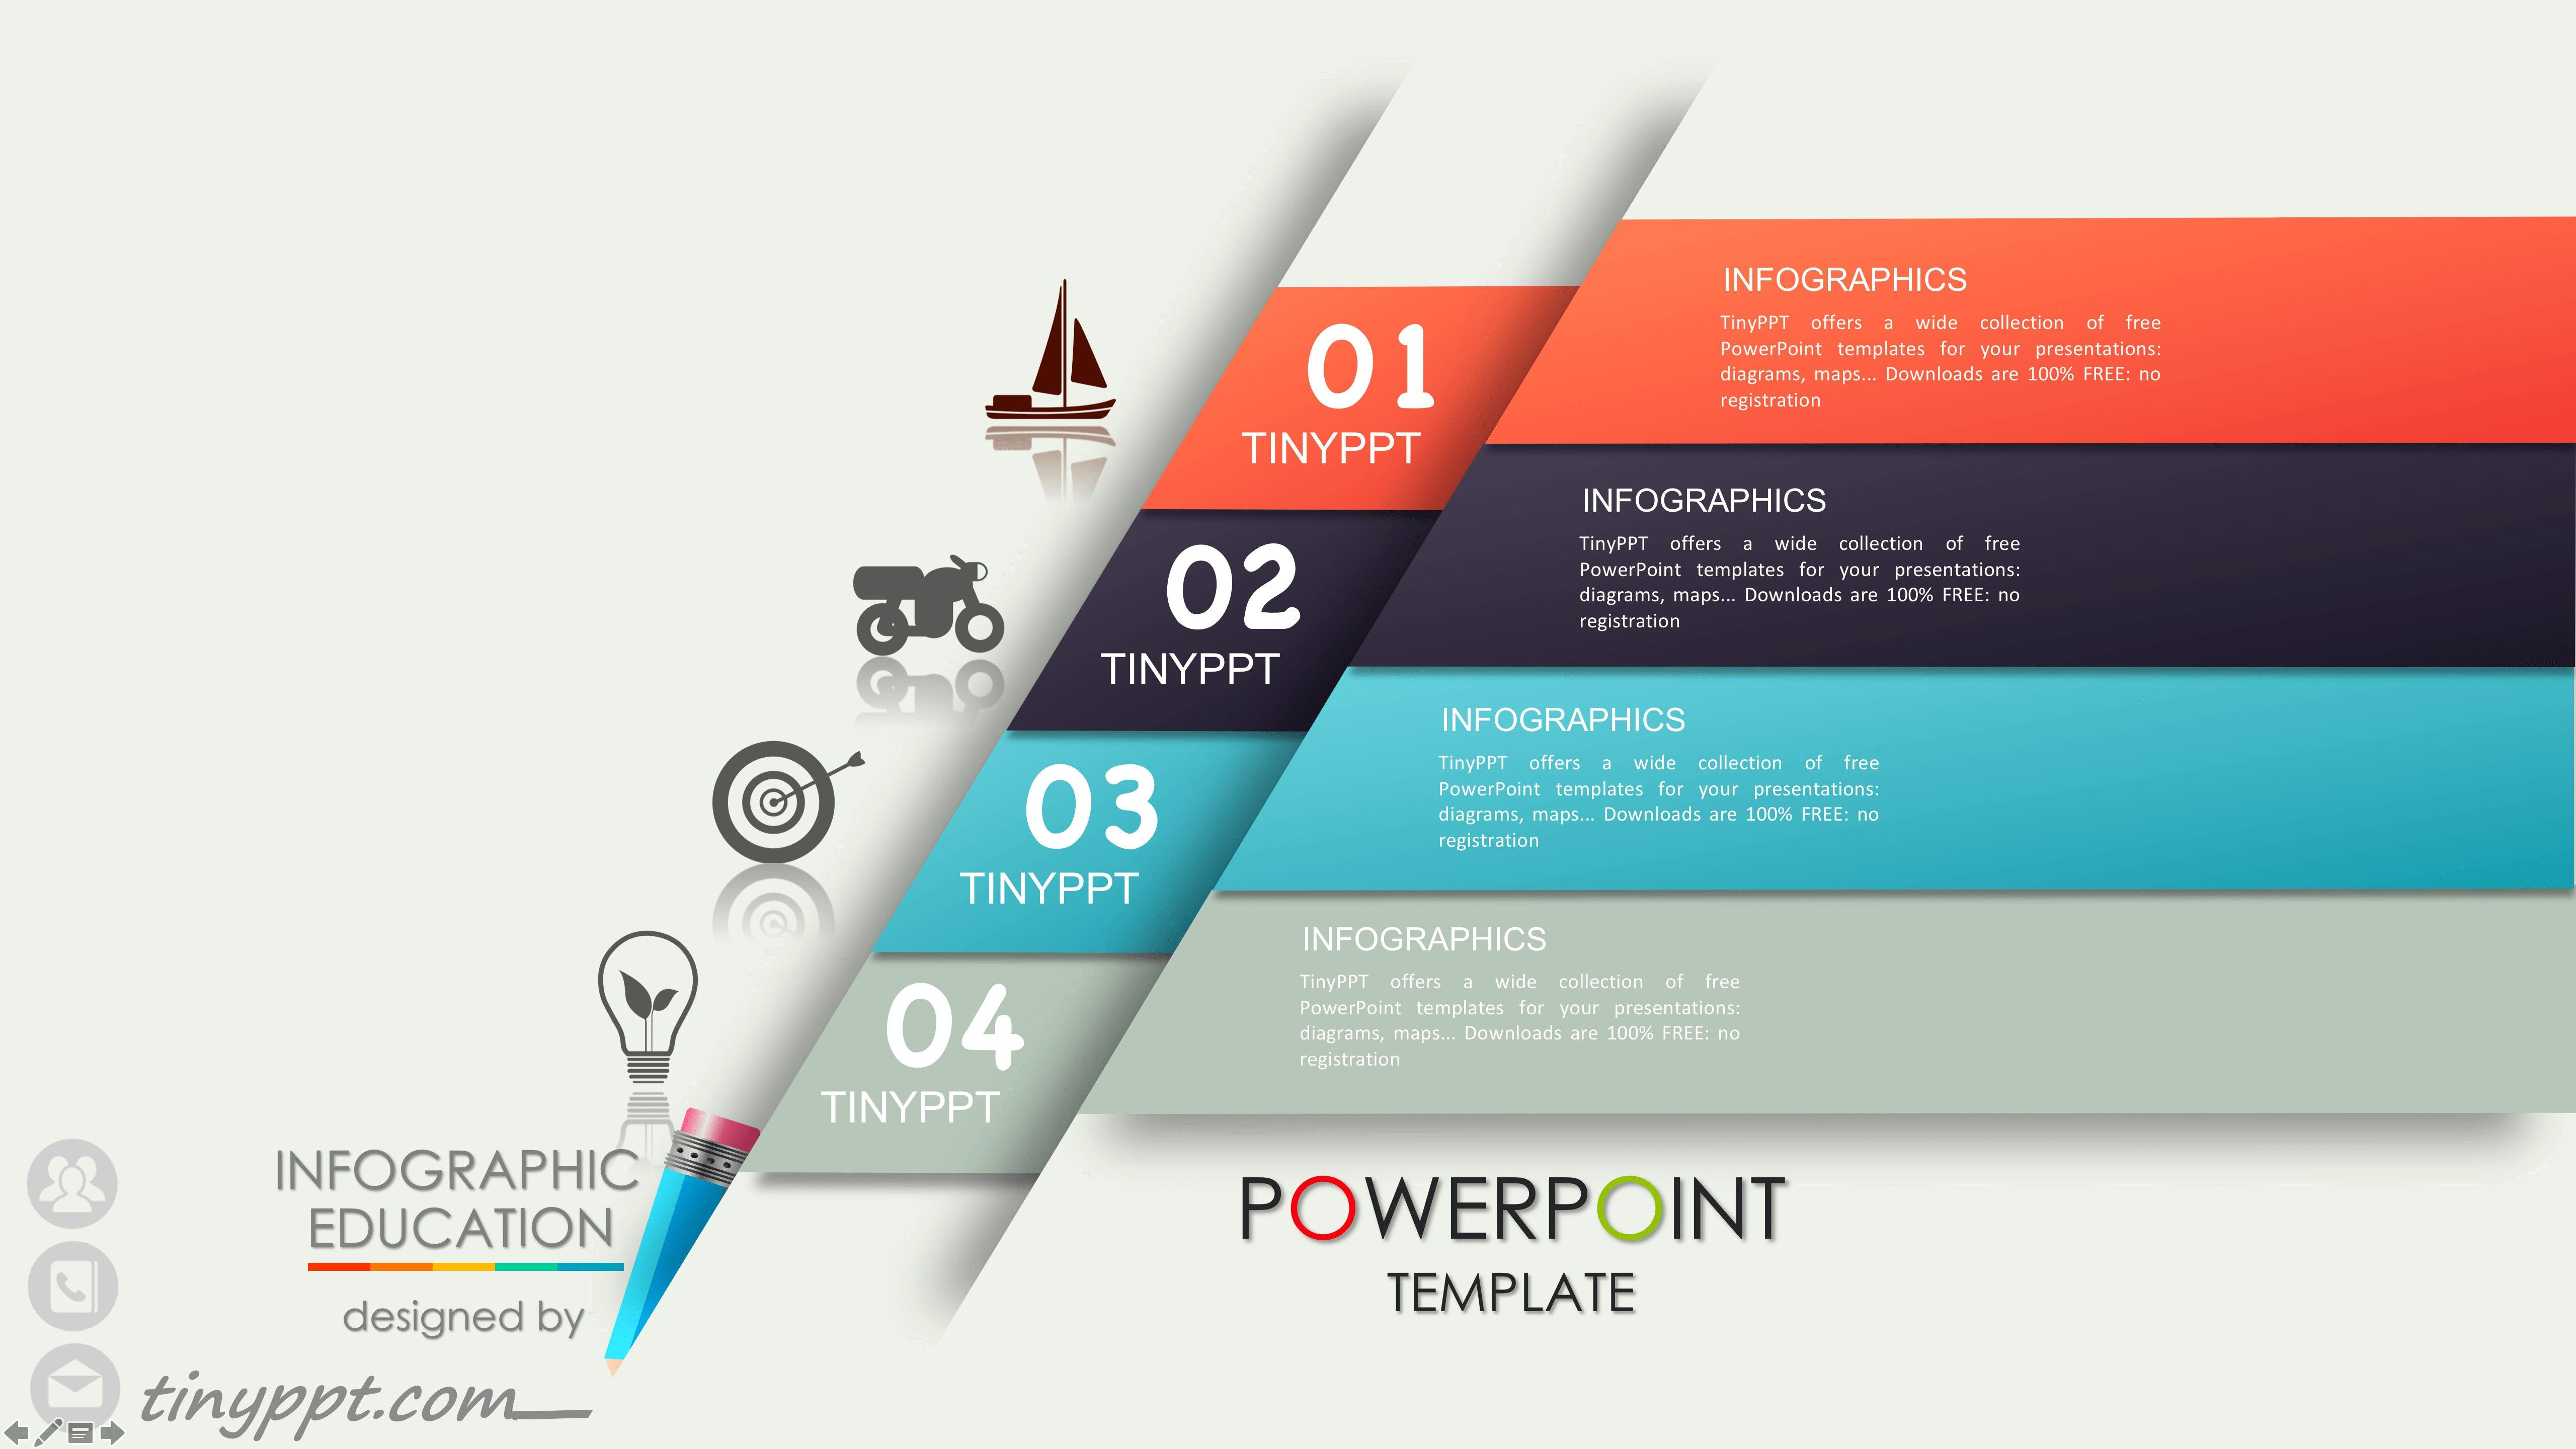 014 Business Proposal Powerpoint Template Free Download Reference Bike Ppt Templates Design Of Kartu Nama Pendidikan Desain